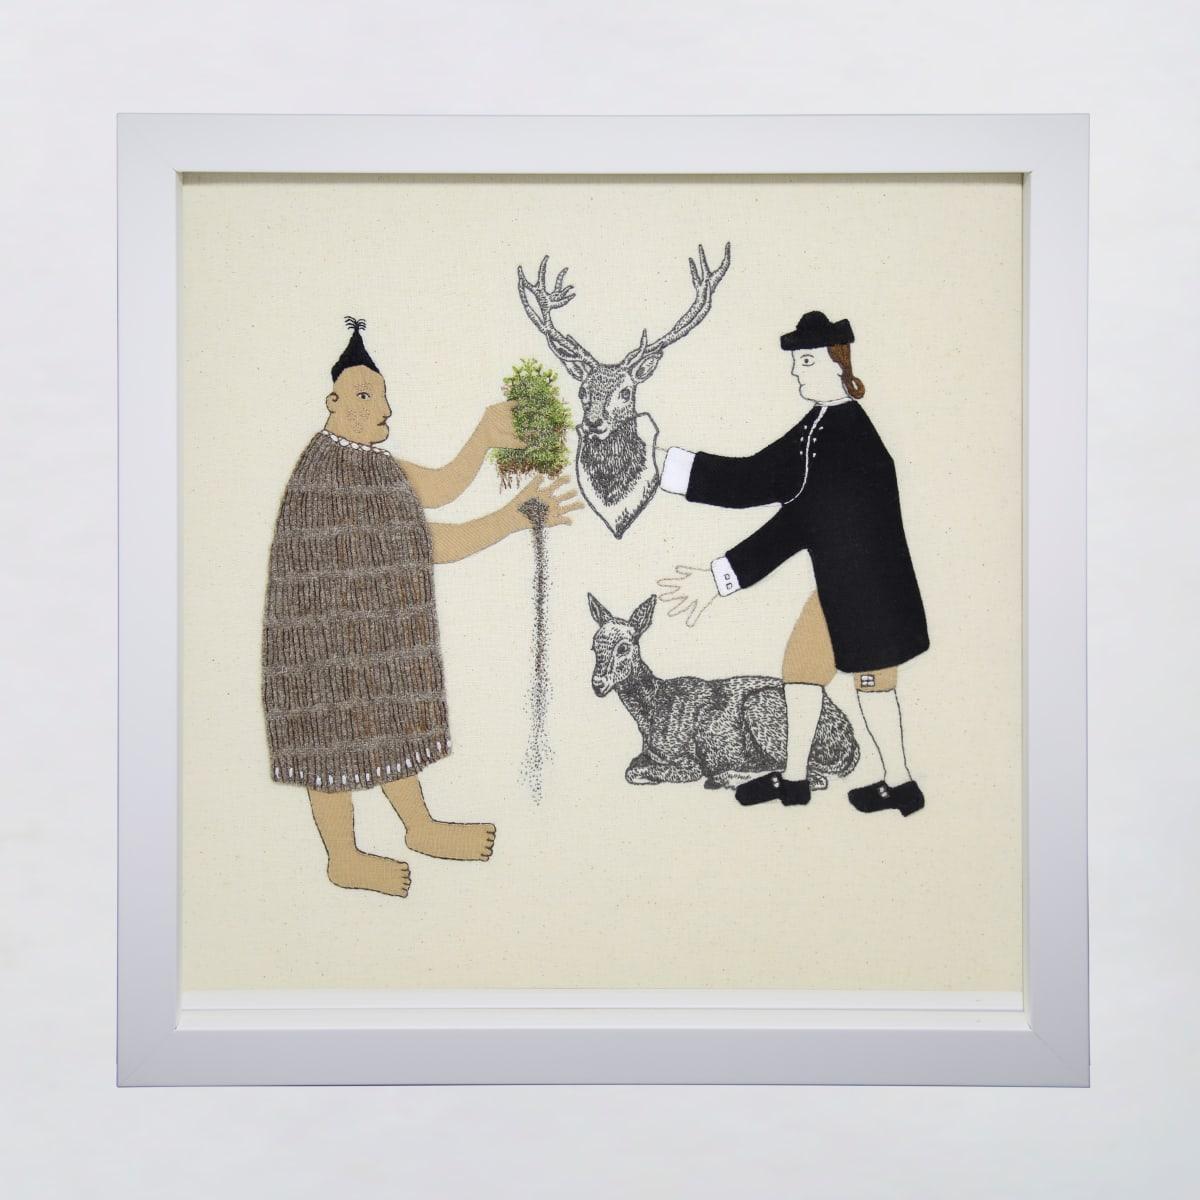 Sarah Munro, Trade Items - Moss, Filmy Ferns, Deer, Erosion, 2019